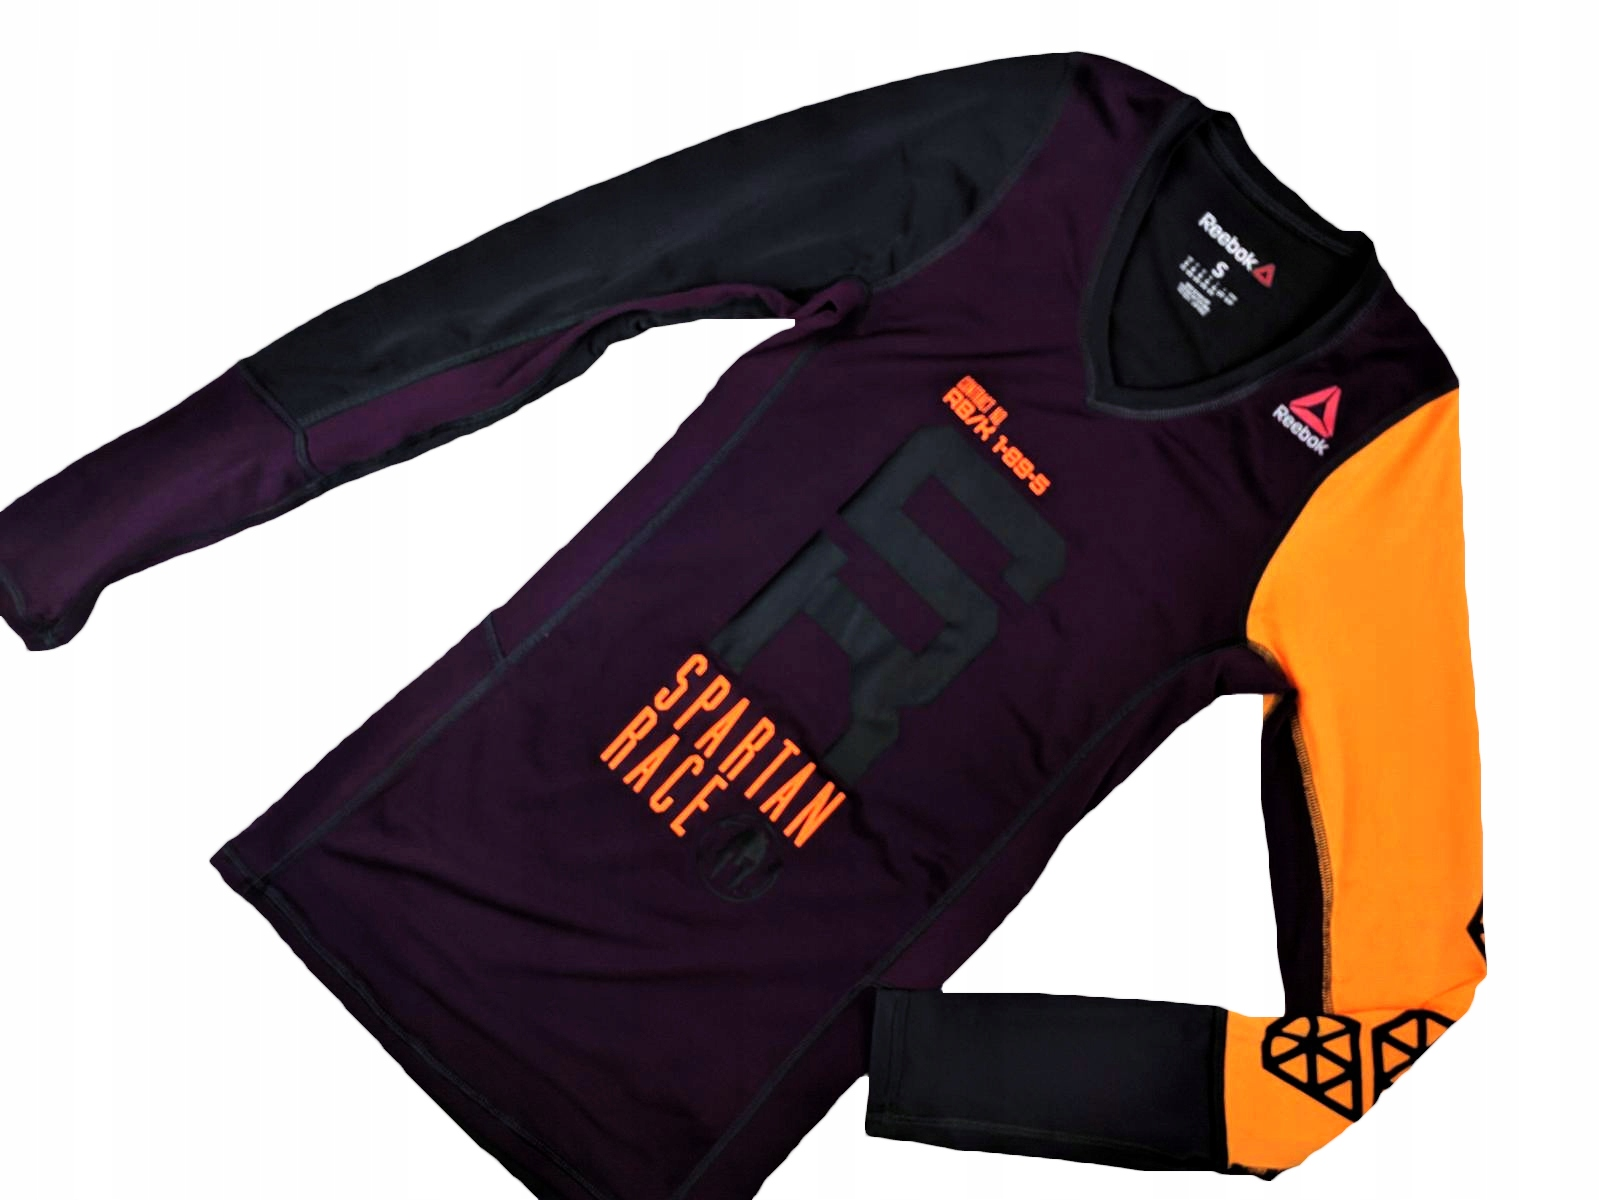 REEBOK SPARTAN RACE koszulka SUPER damka BORDO _S